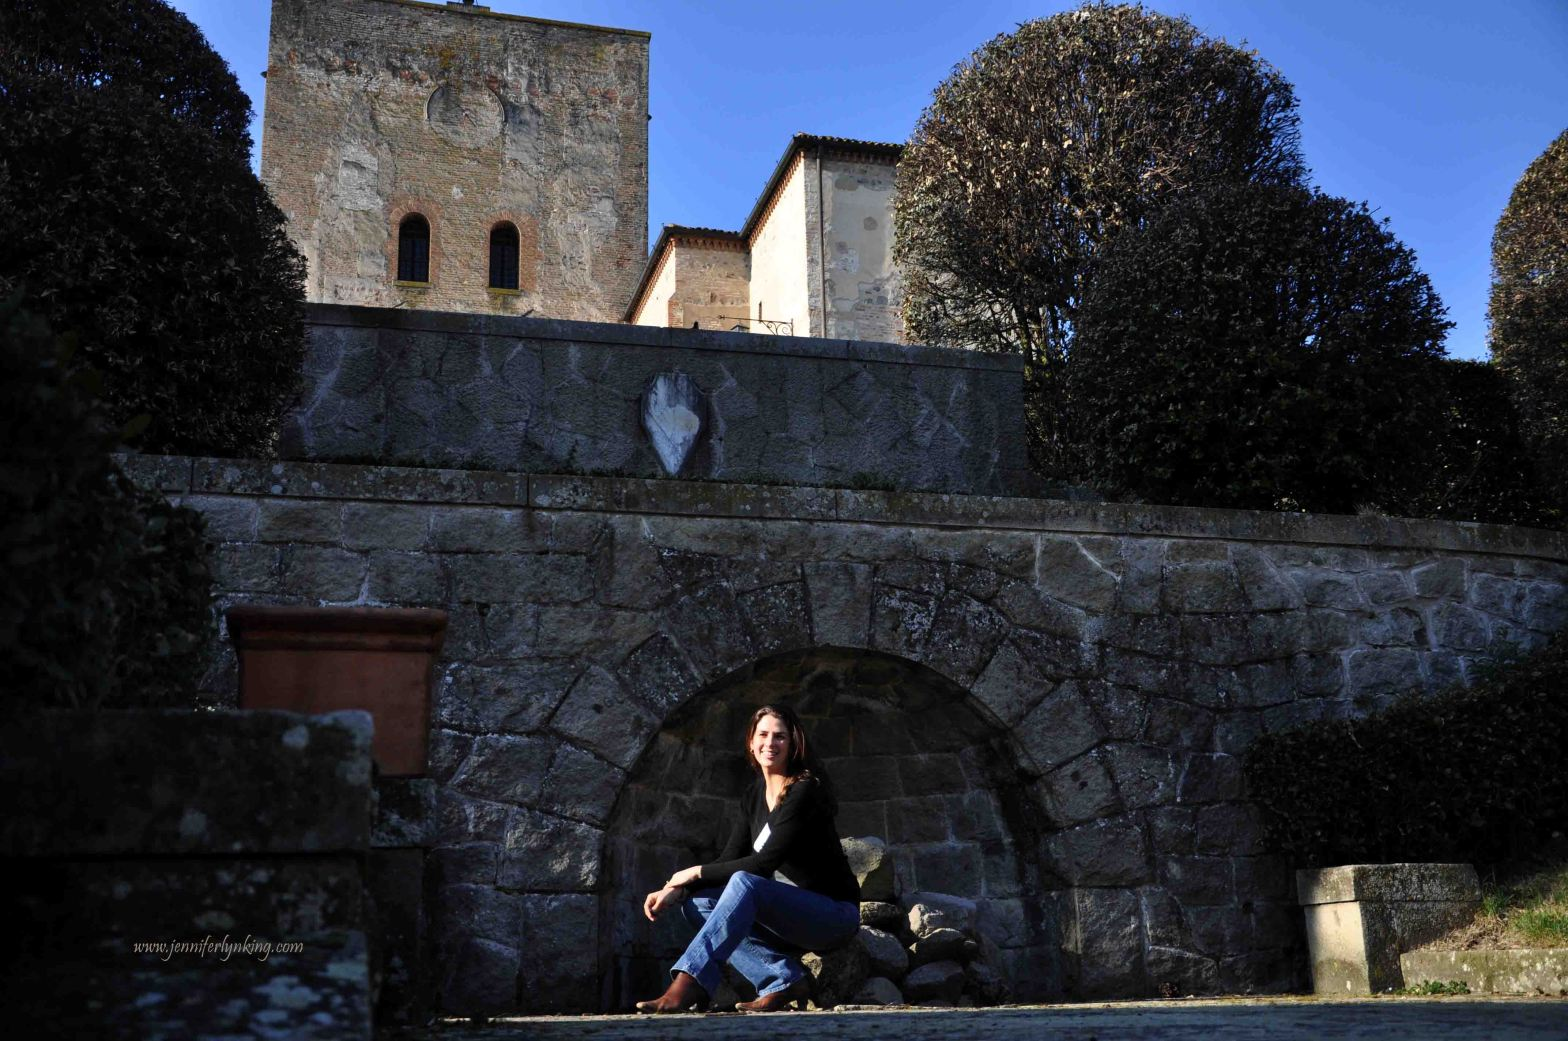 Jennifer Lyn King at a Castle in Italy